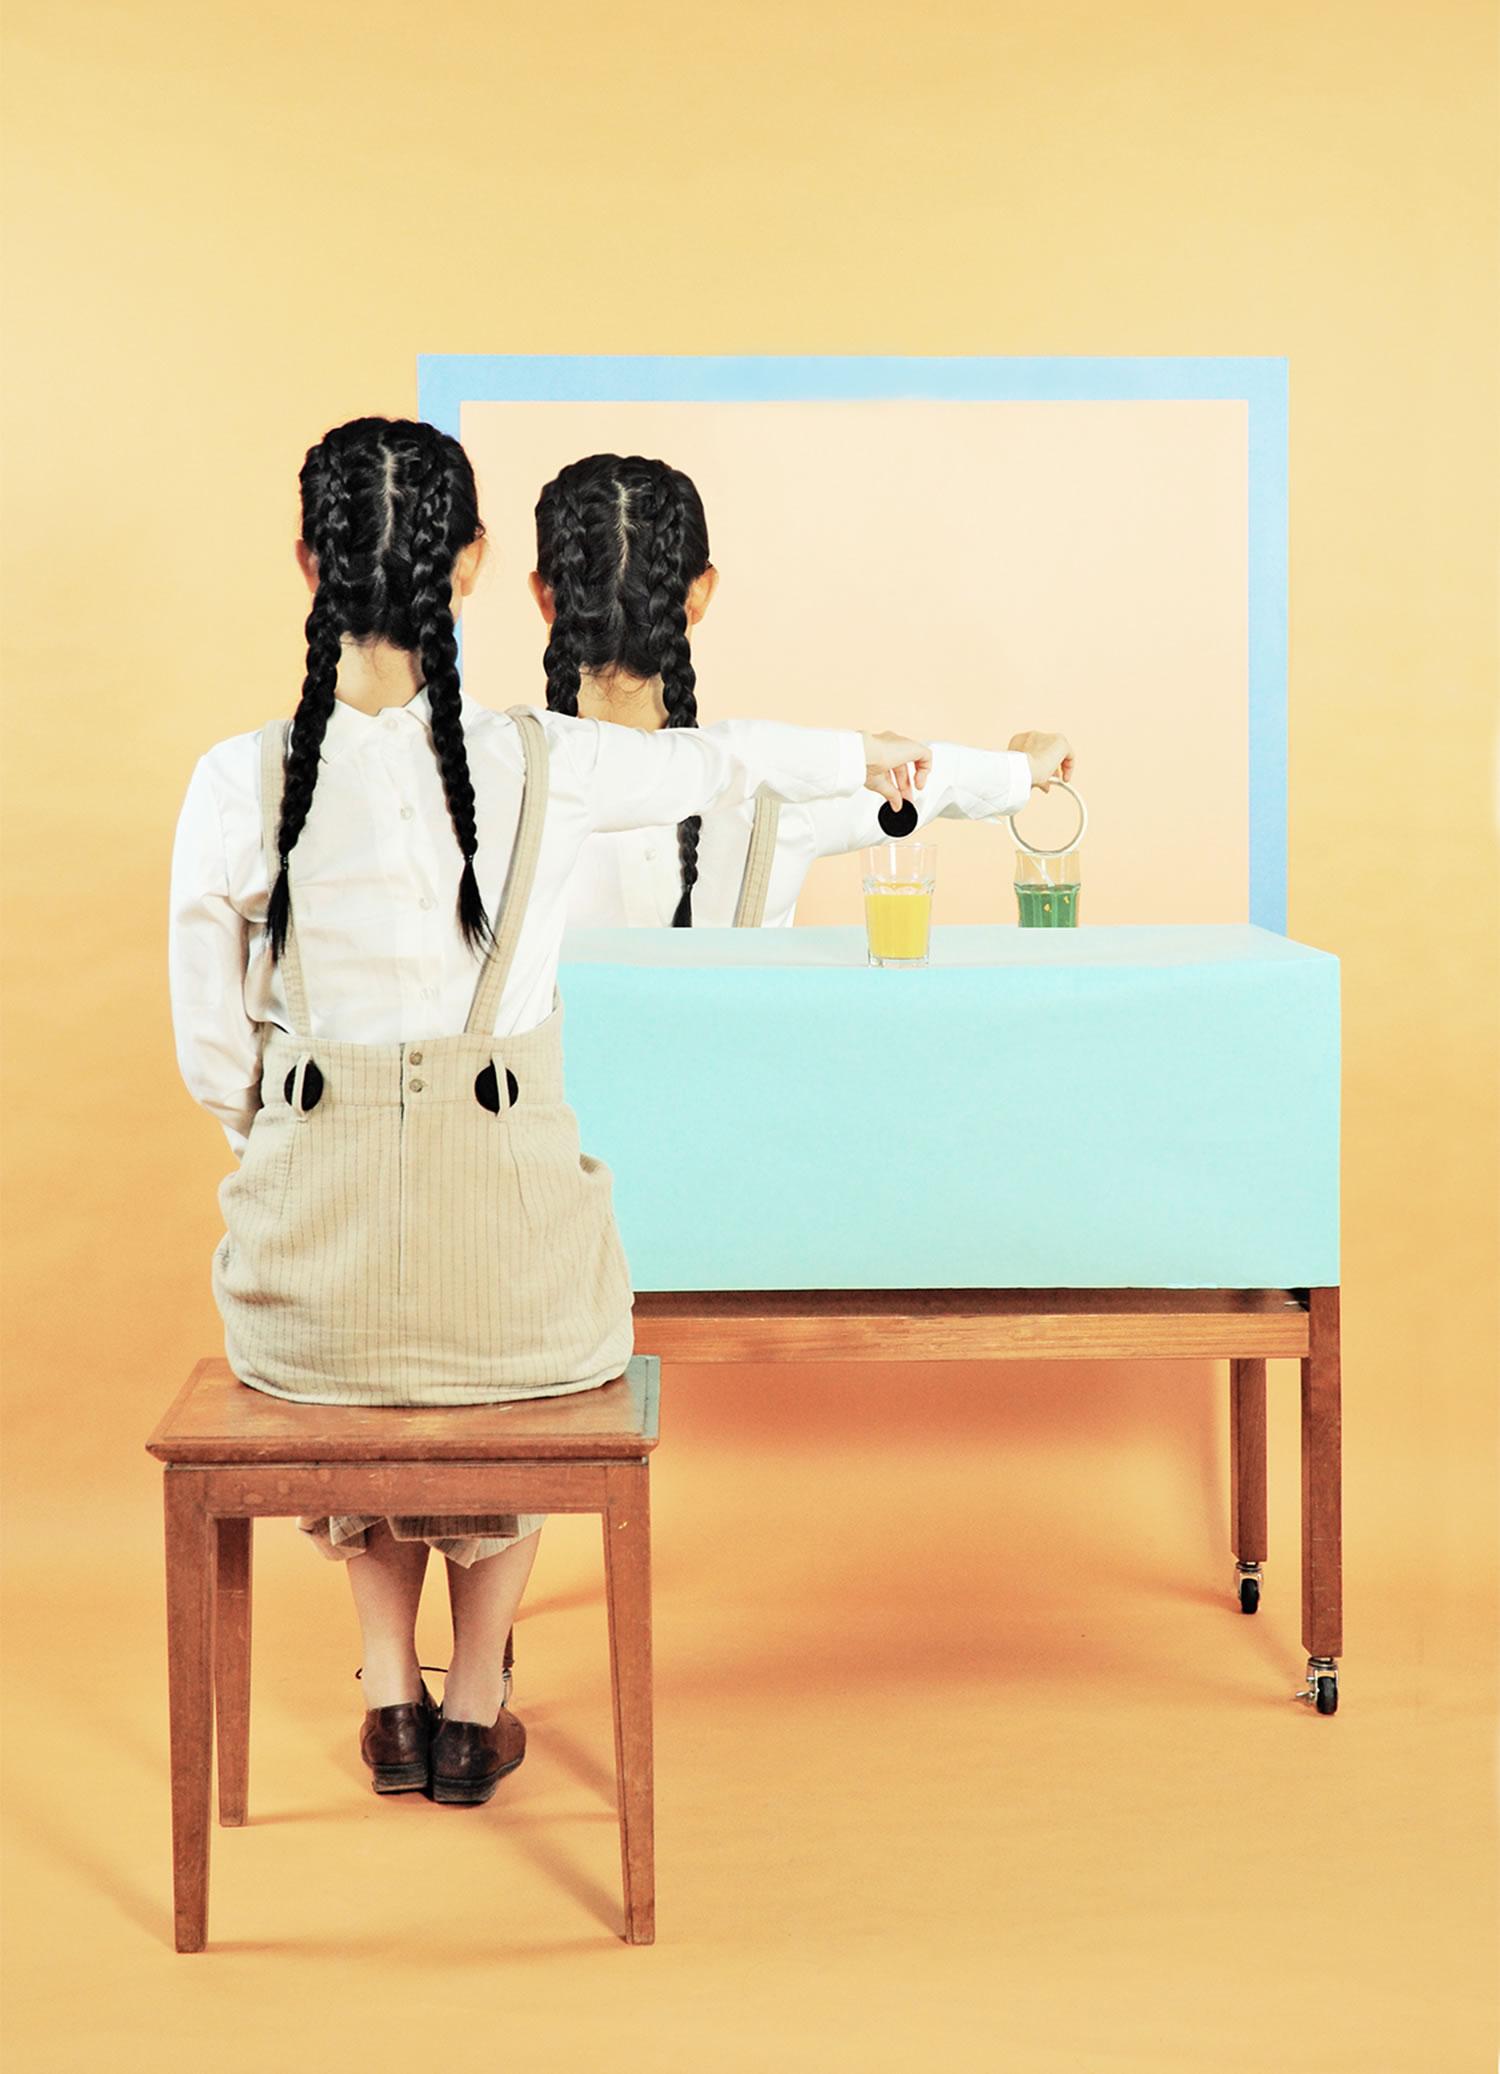 fotografi-ispirazione-rene-magritte-fotografia-arte-05